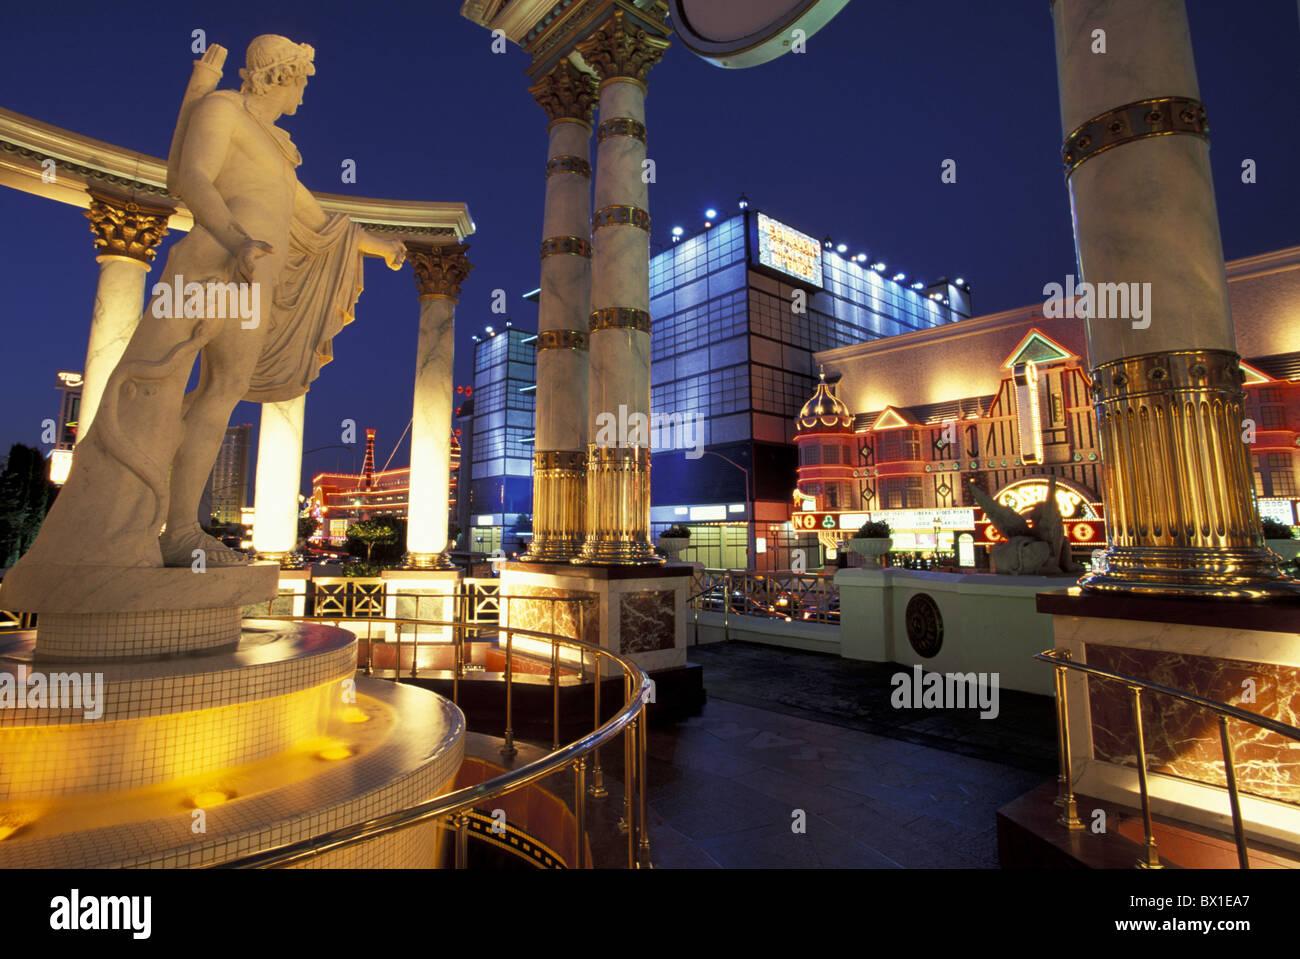 Caesars Palace Las Vegas Nevada USA America United States night sculpture - Stock Image